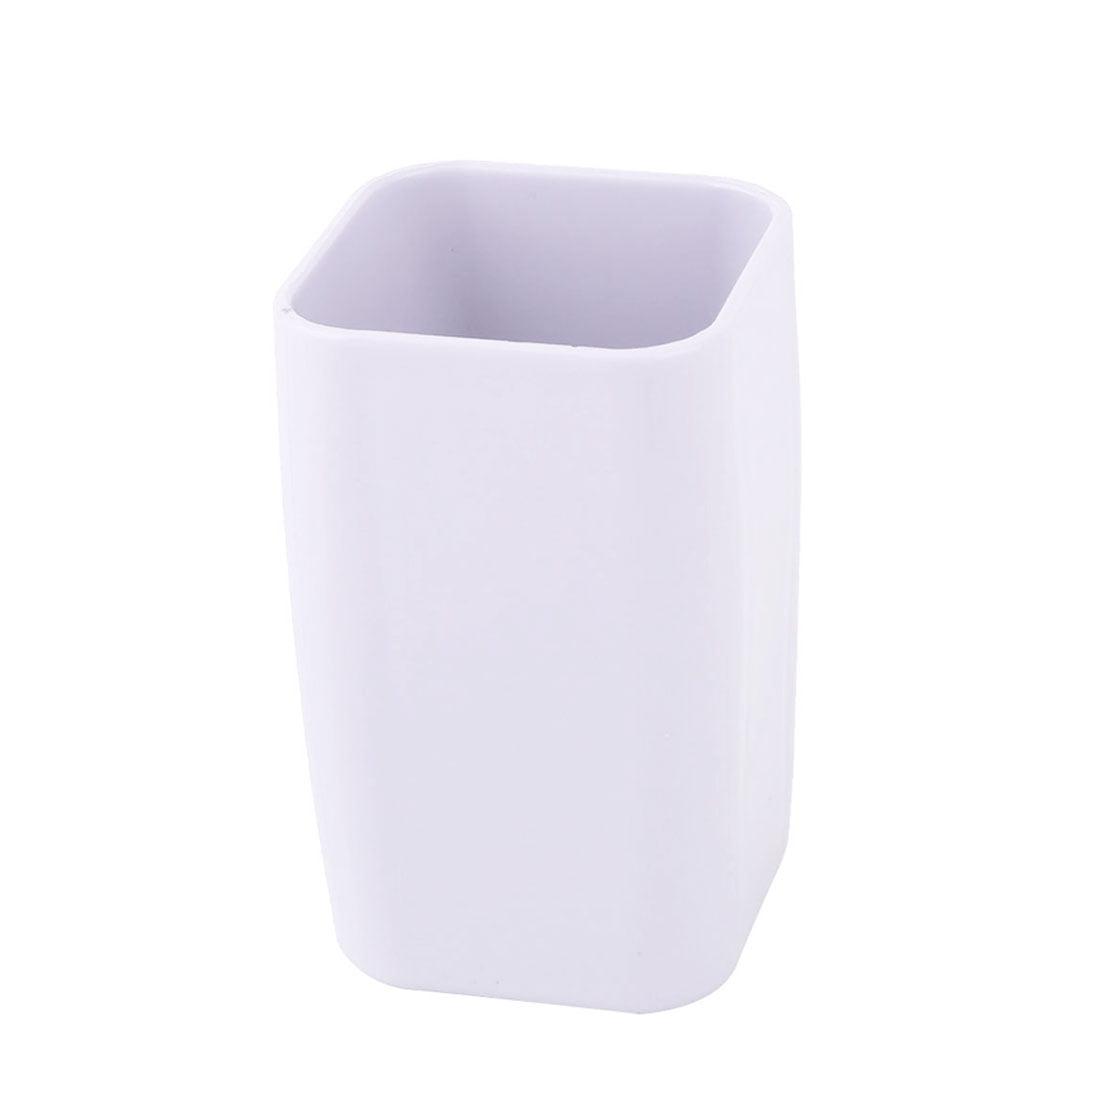 Bathroom Plastic Toothbrush Holder Tooth Cleaning Mug Cup Light Purple 300ml - image 4 of 4